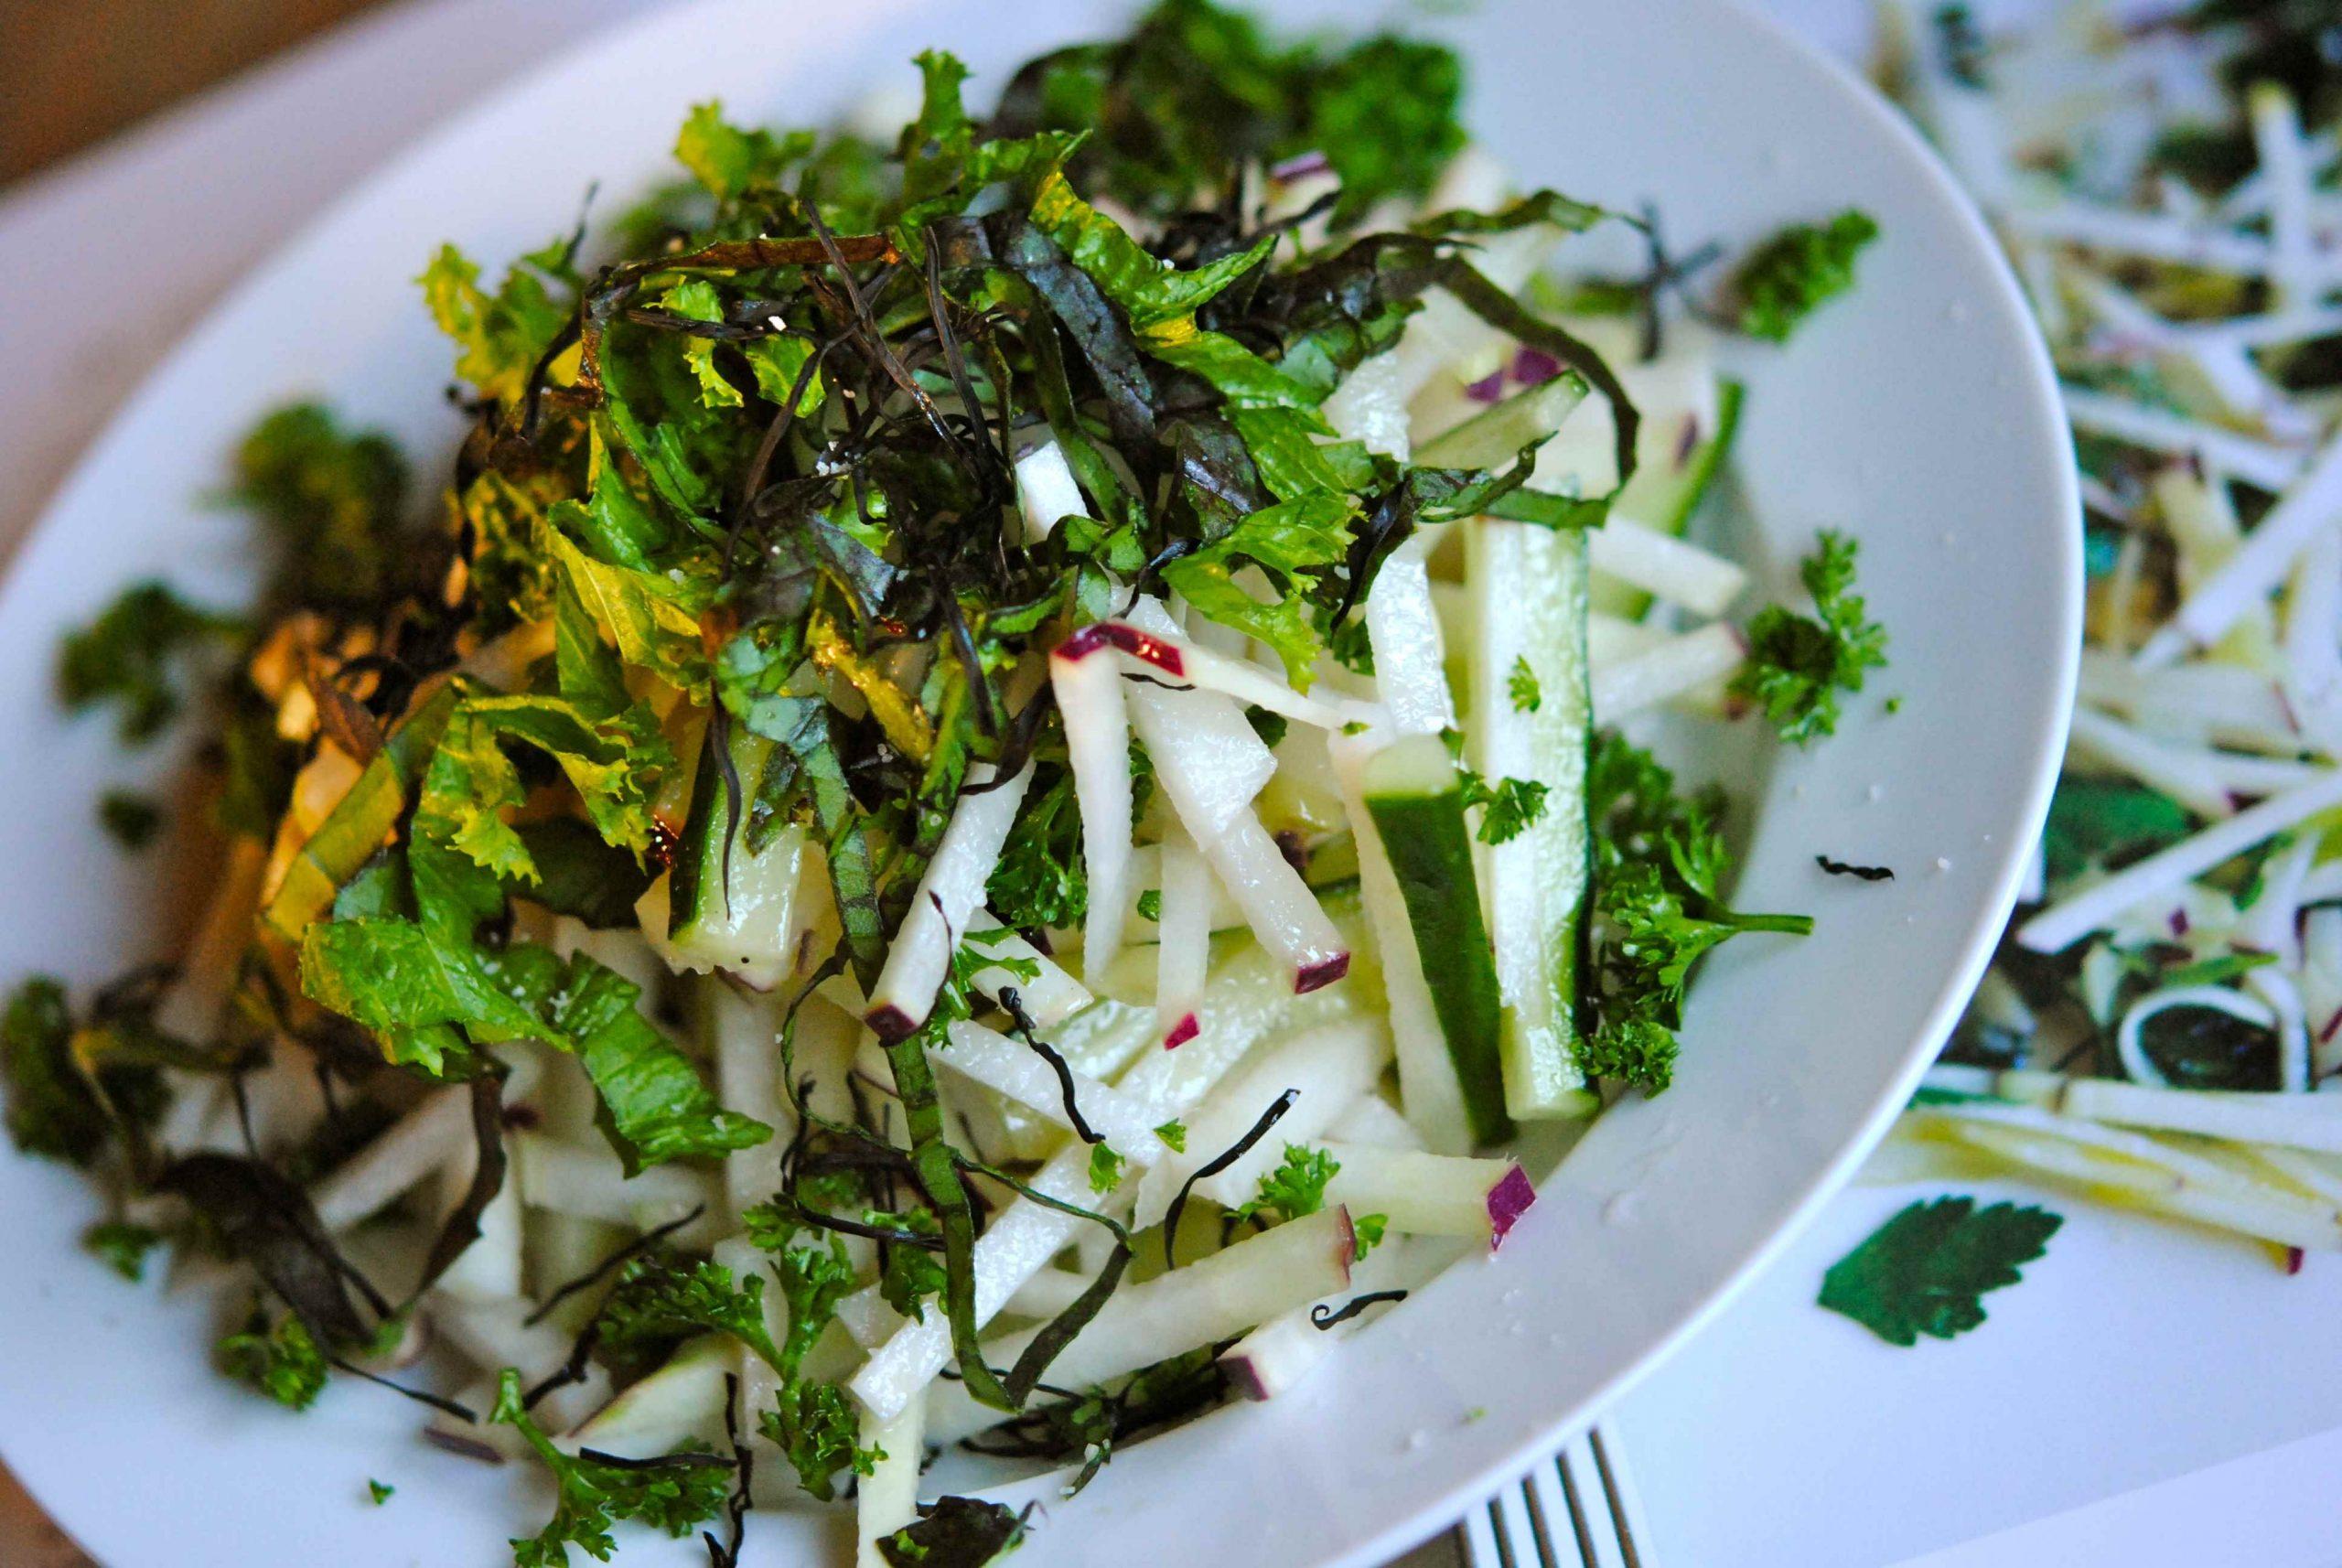 Salade de chou-rave, moutarde, persil et algue